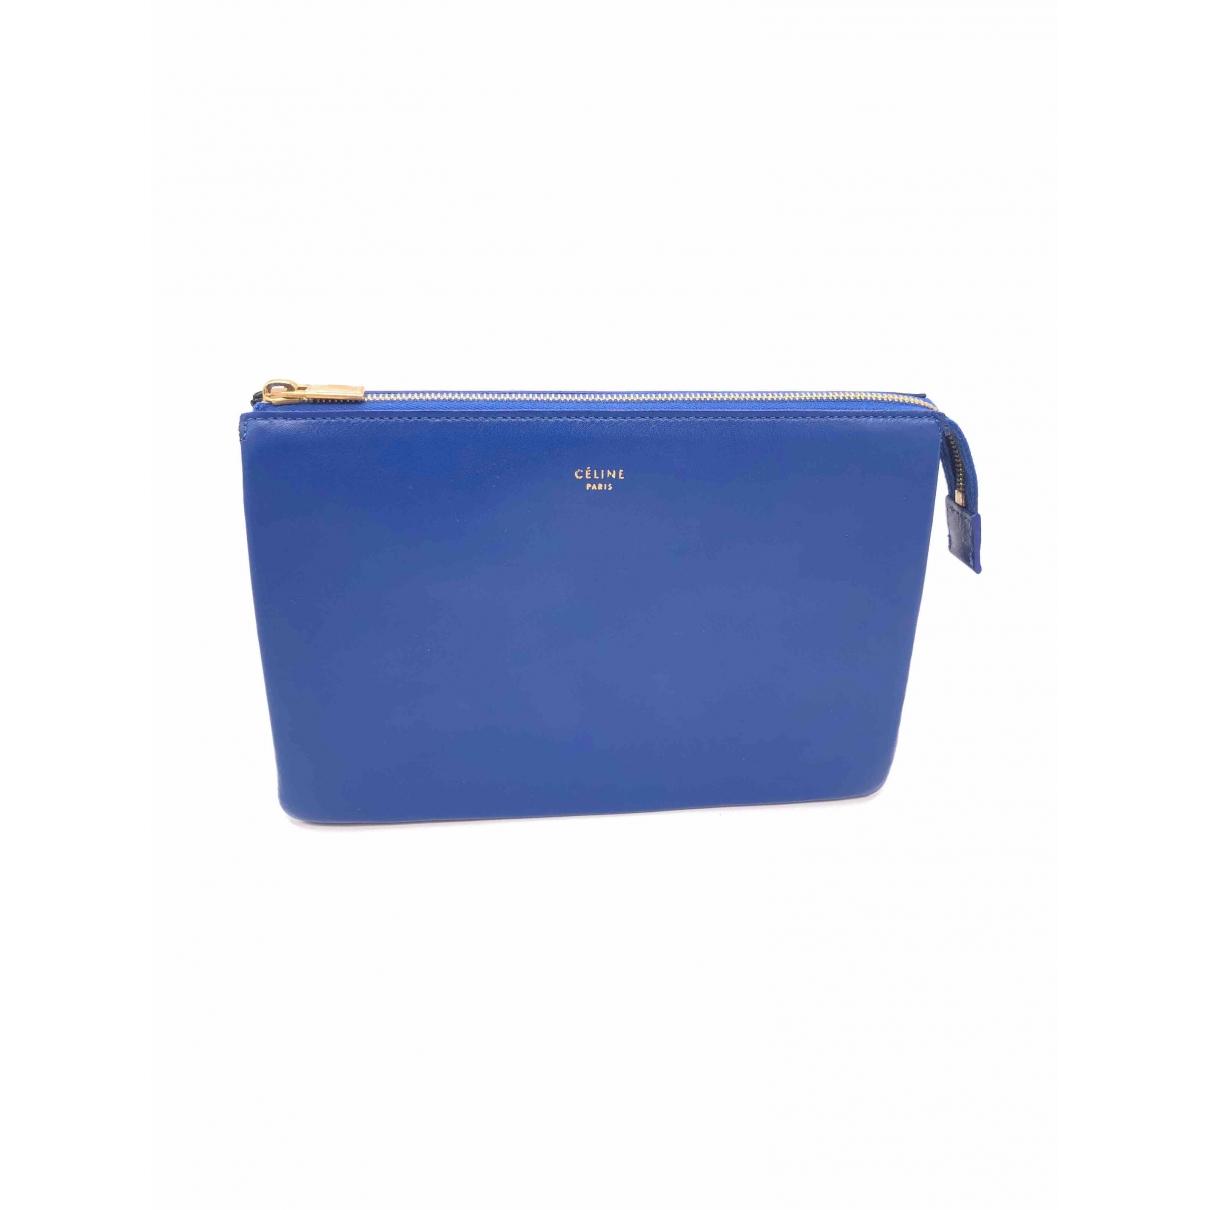 Celine \N Kleinlederwaren in  Blau Leder